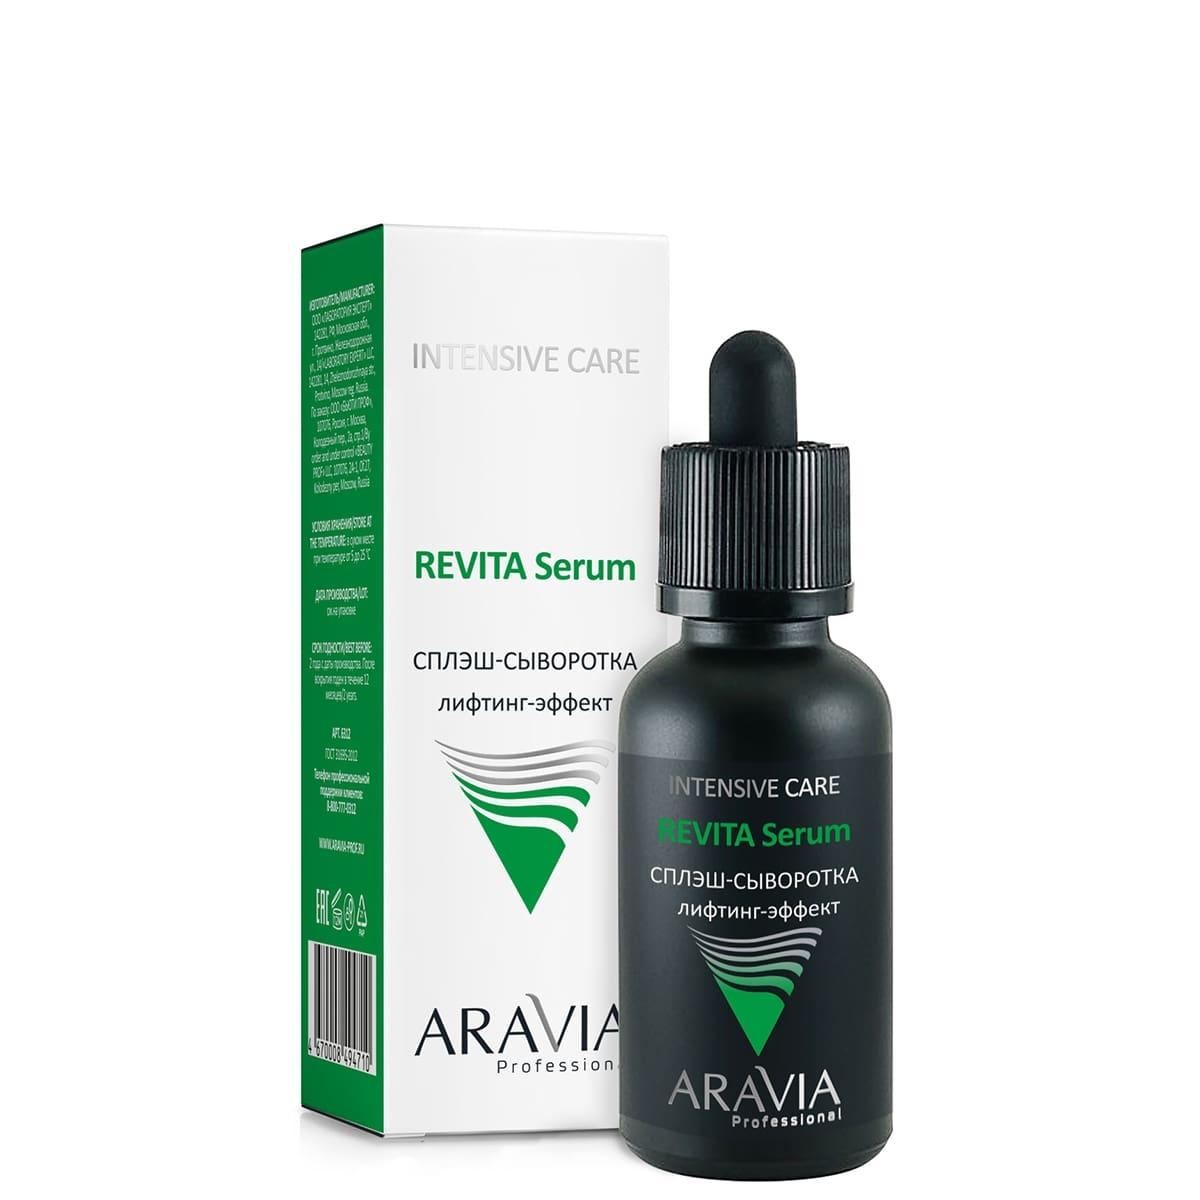 ARAVIA Сплэш-Сыворотка Revita Serum для Лица Лифтинг-Эффект, 30 мл сыворотка лифтинг для моделирования овала лица shine is lifting control 15 мл